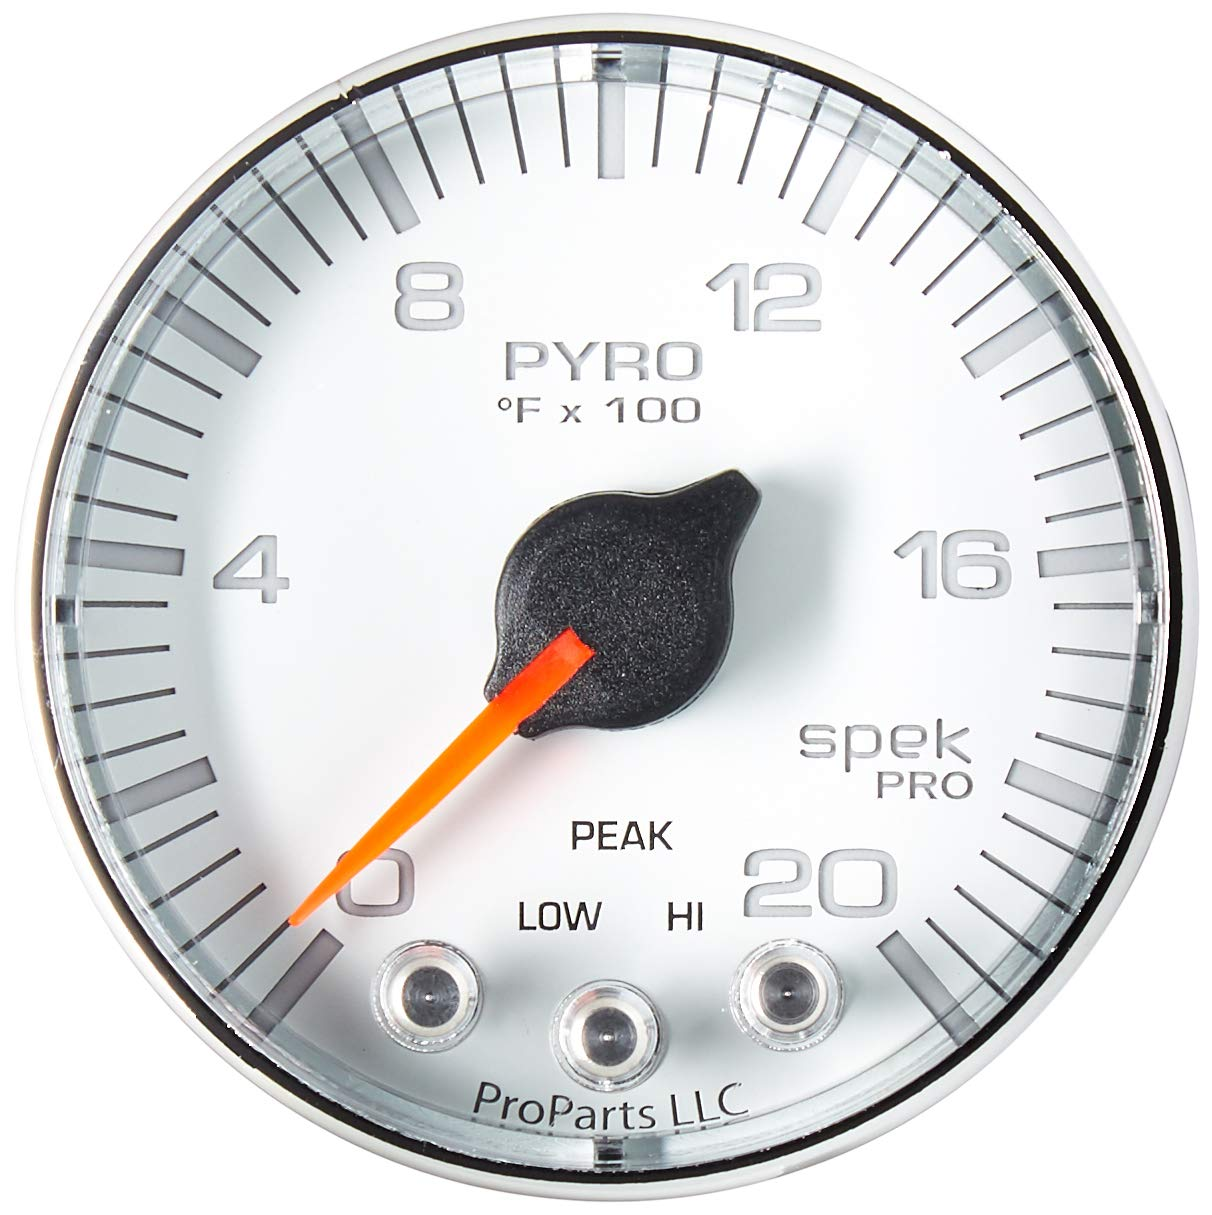 Auto Meter AutoMeter P310118 Gauge, Pyro. (Egt), 2 1/16'', 2000ºf, Stepper Motor W/Peak & Warn, Wht/Chrm, Spek-Pro